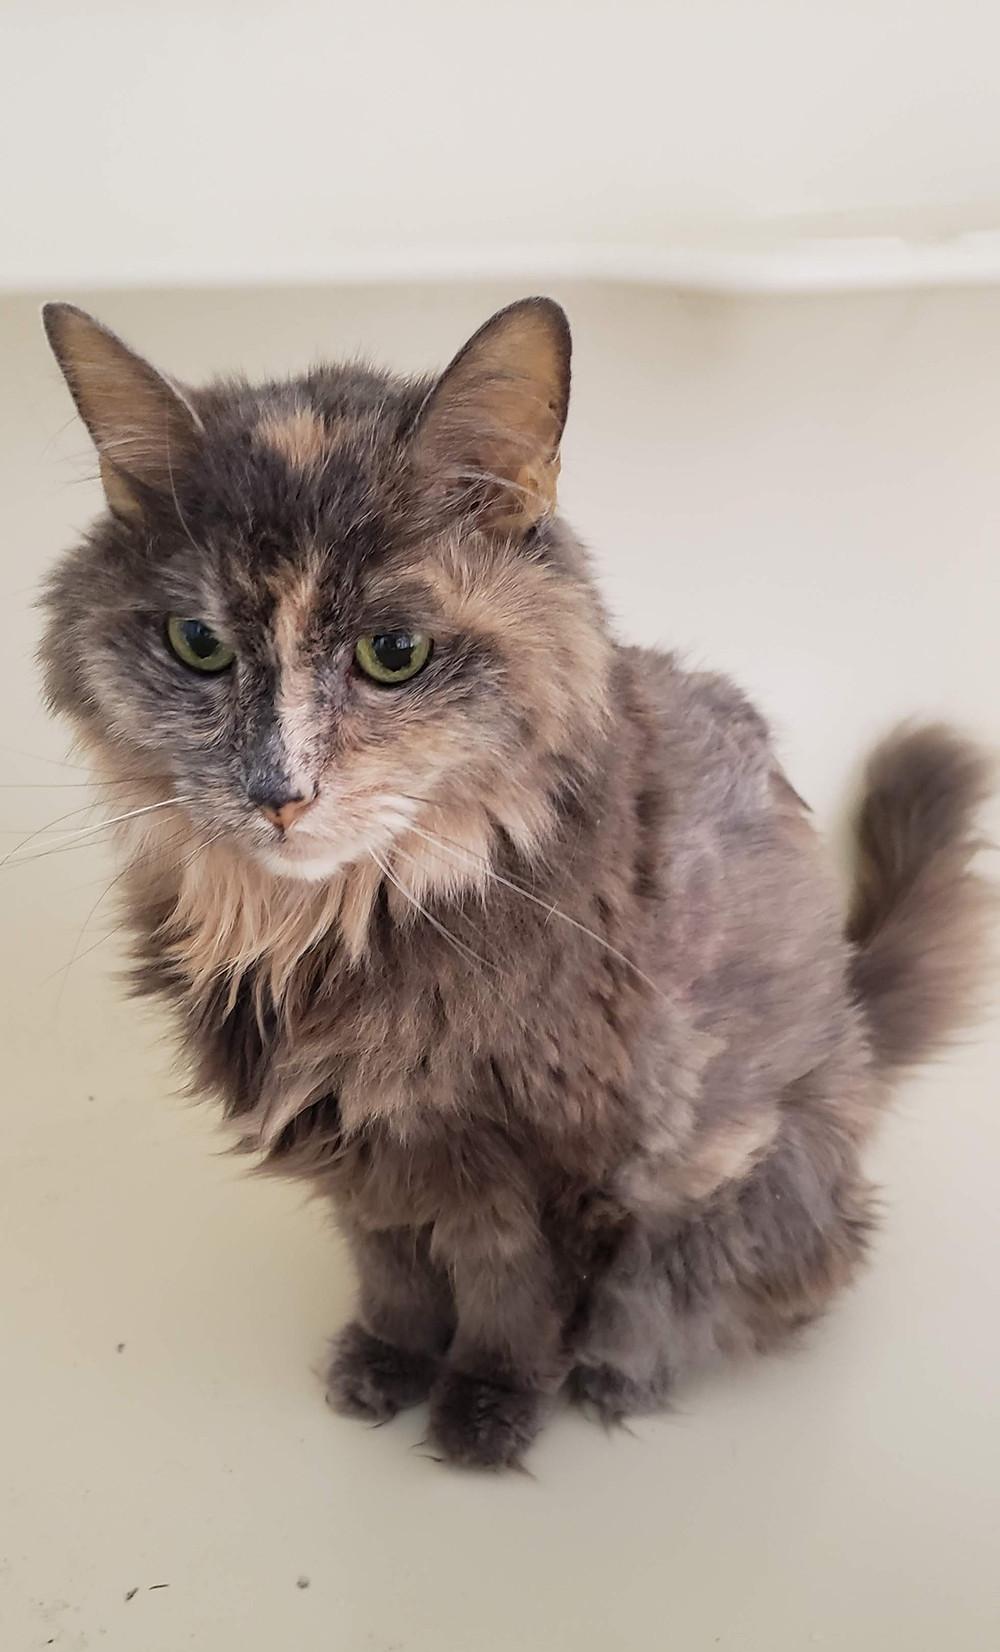 senior cat, health, mental health, grief, loss, wellness